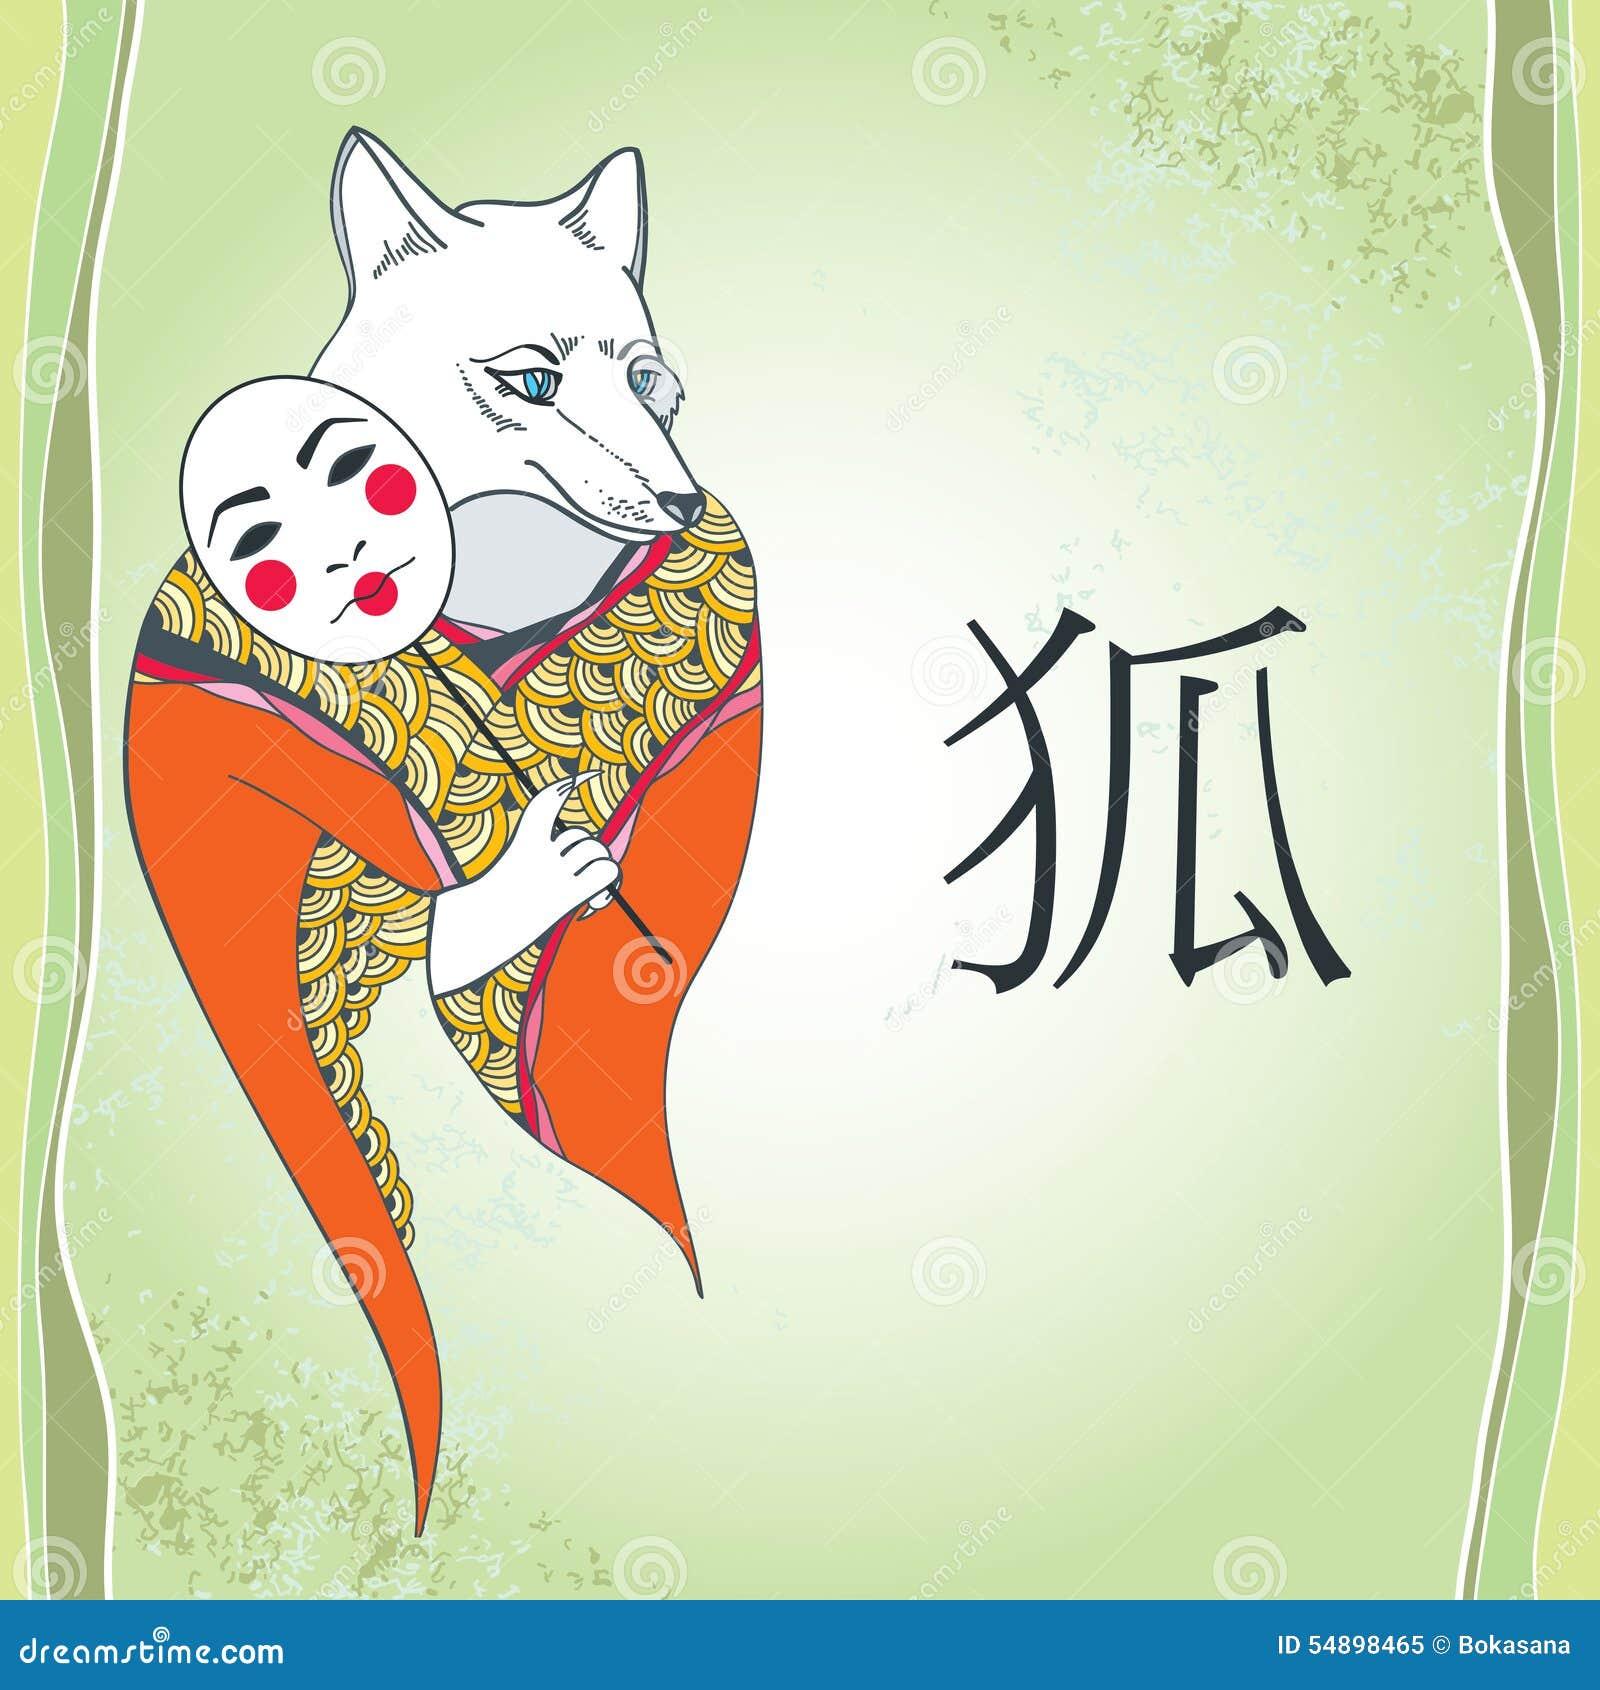 Mitologiczny Kitsune Legendarny lis od Japońskiego folkloru Serie mitologiczne istoty